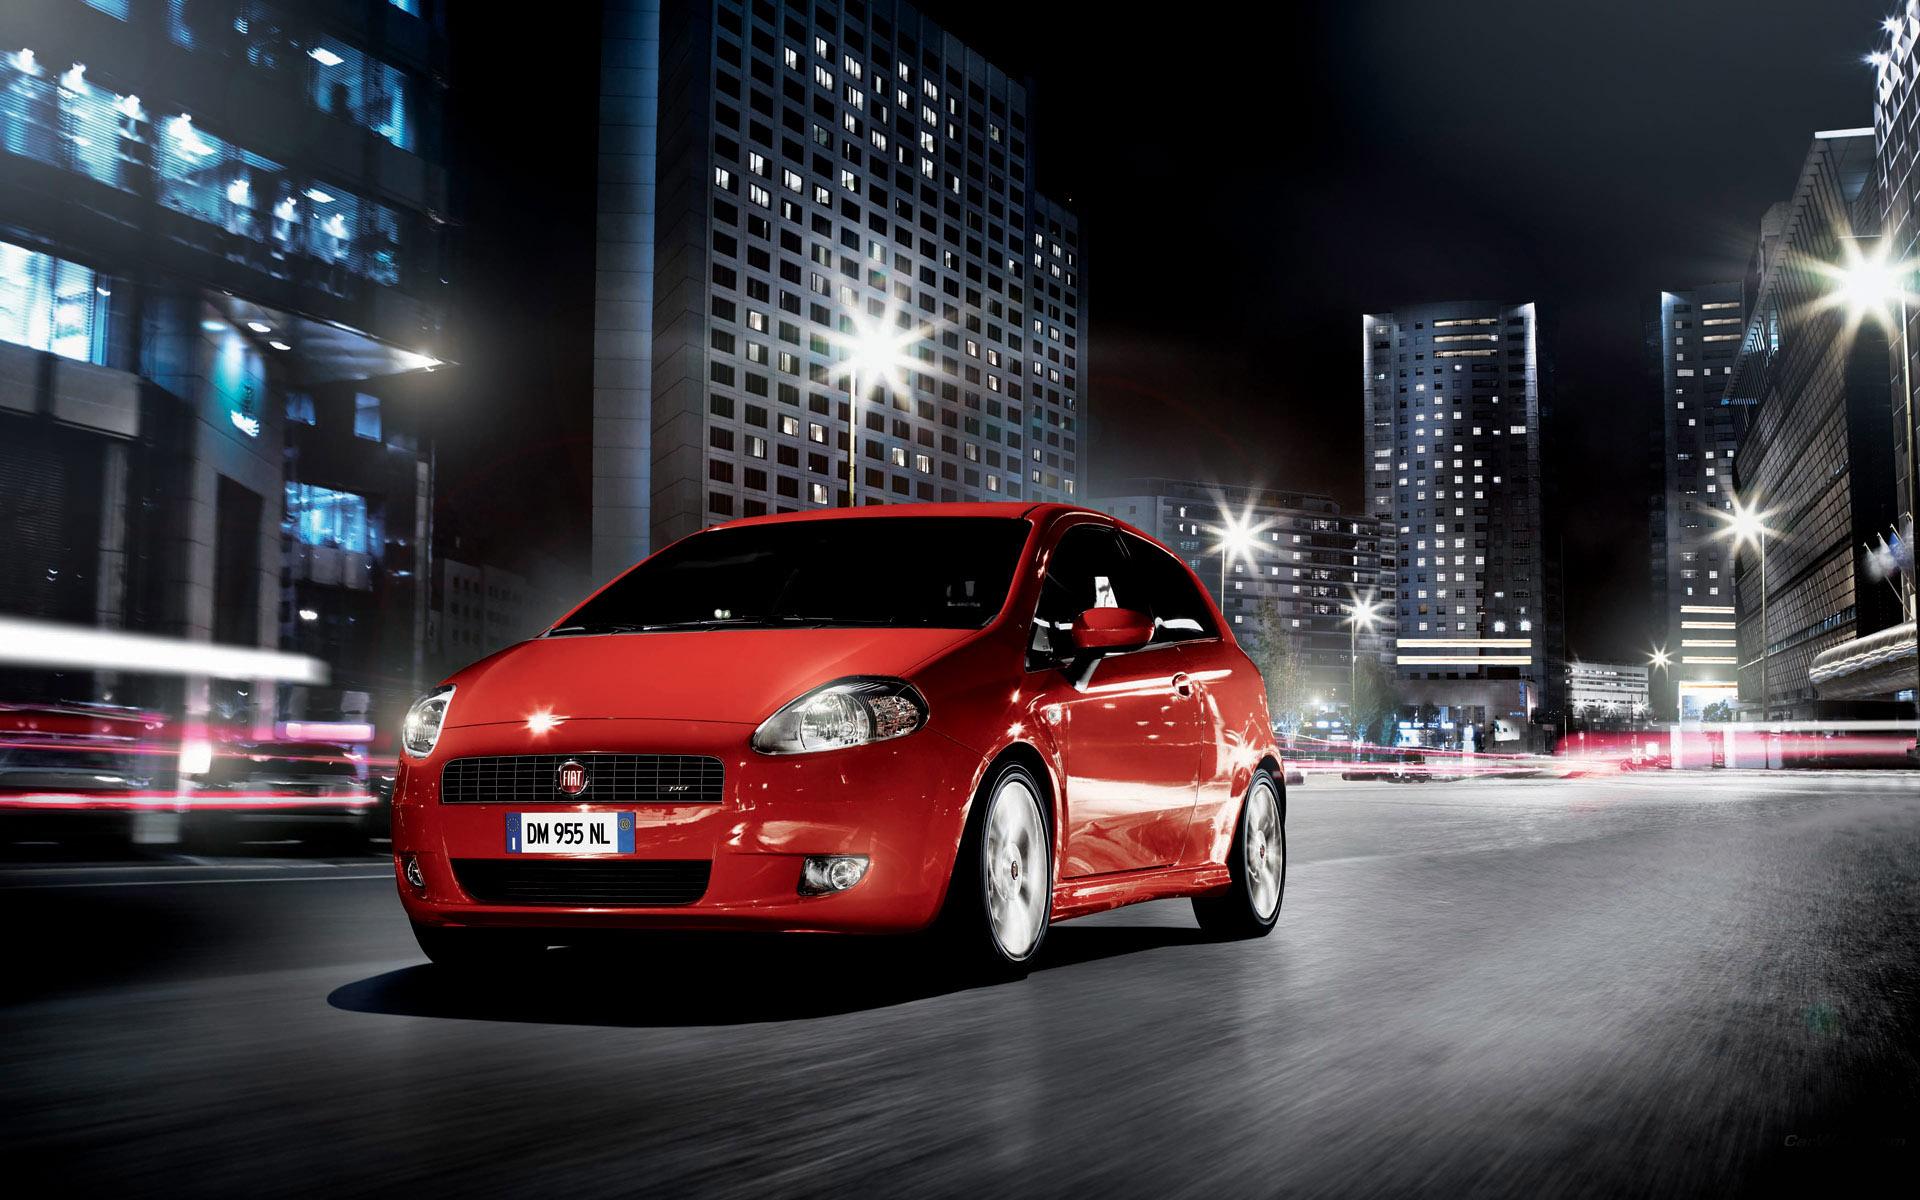 Fiat S Wallpaper